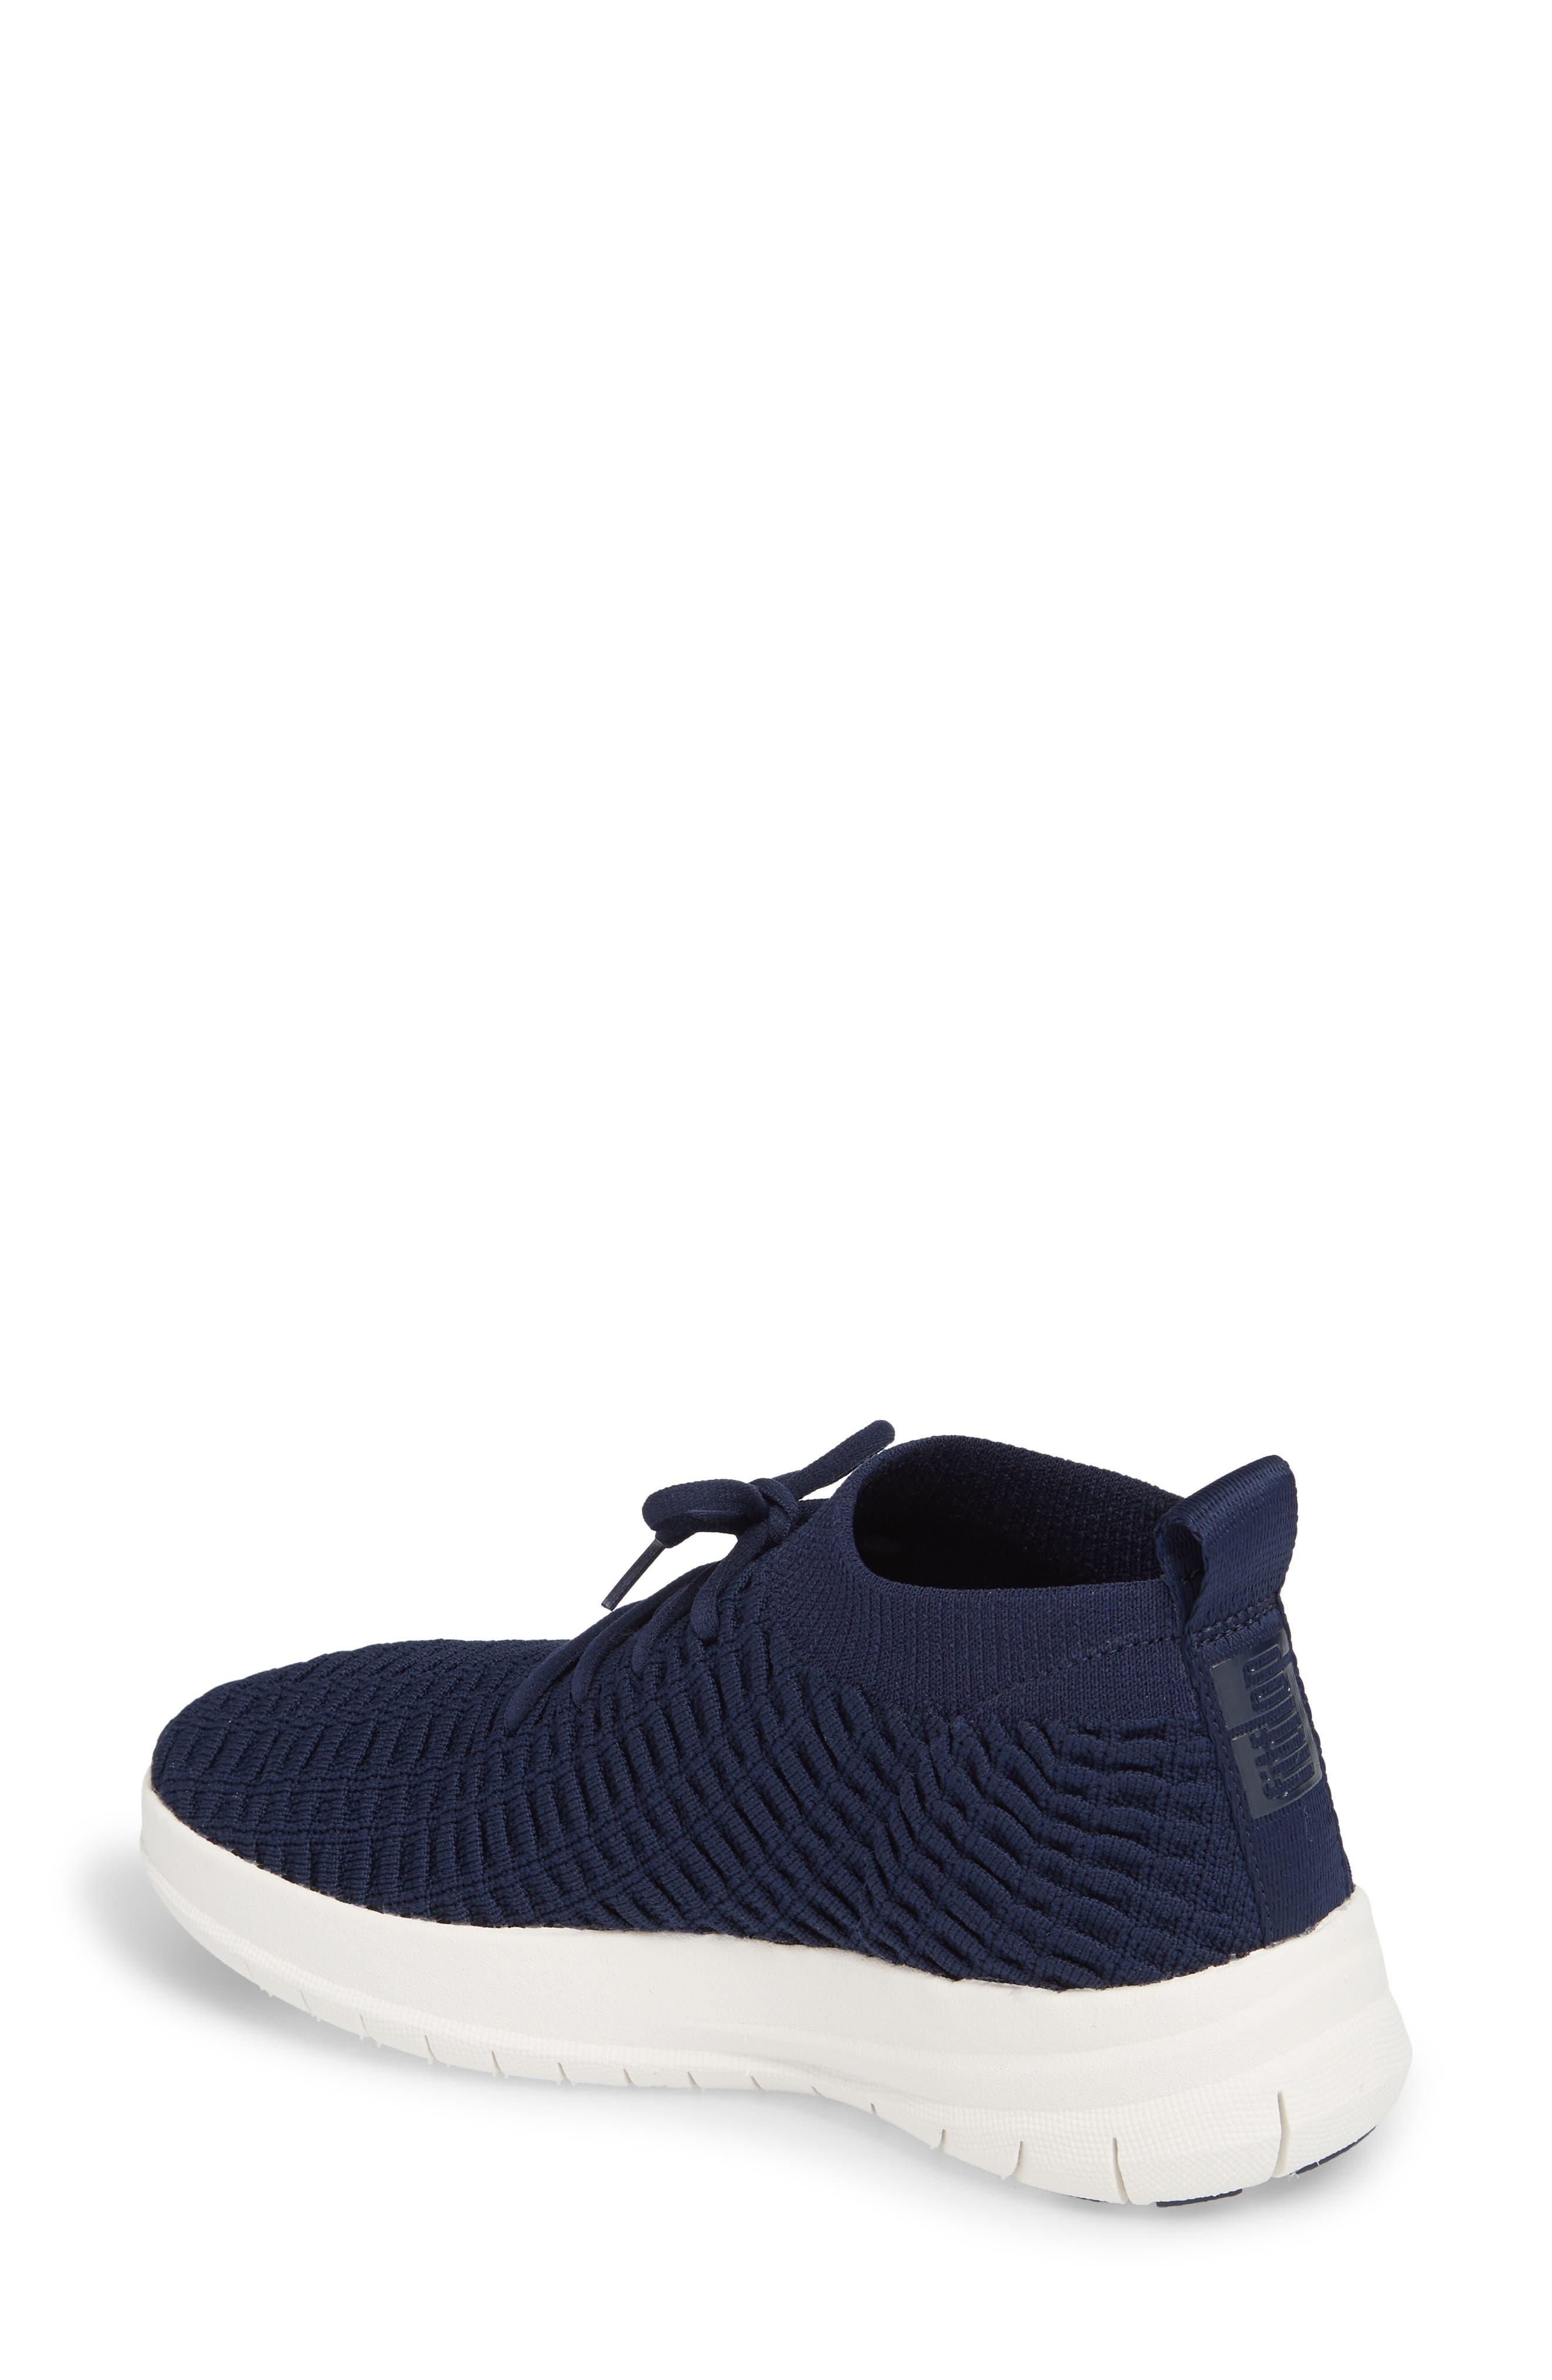 Uberknit<sup>™</sup> Slip-On High Top Sneaker,                             Alternate thumbnail 2, color,                             Midnight Navy